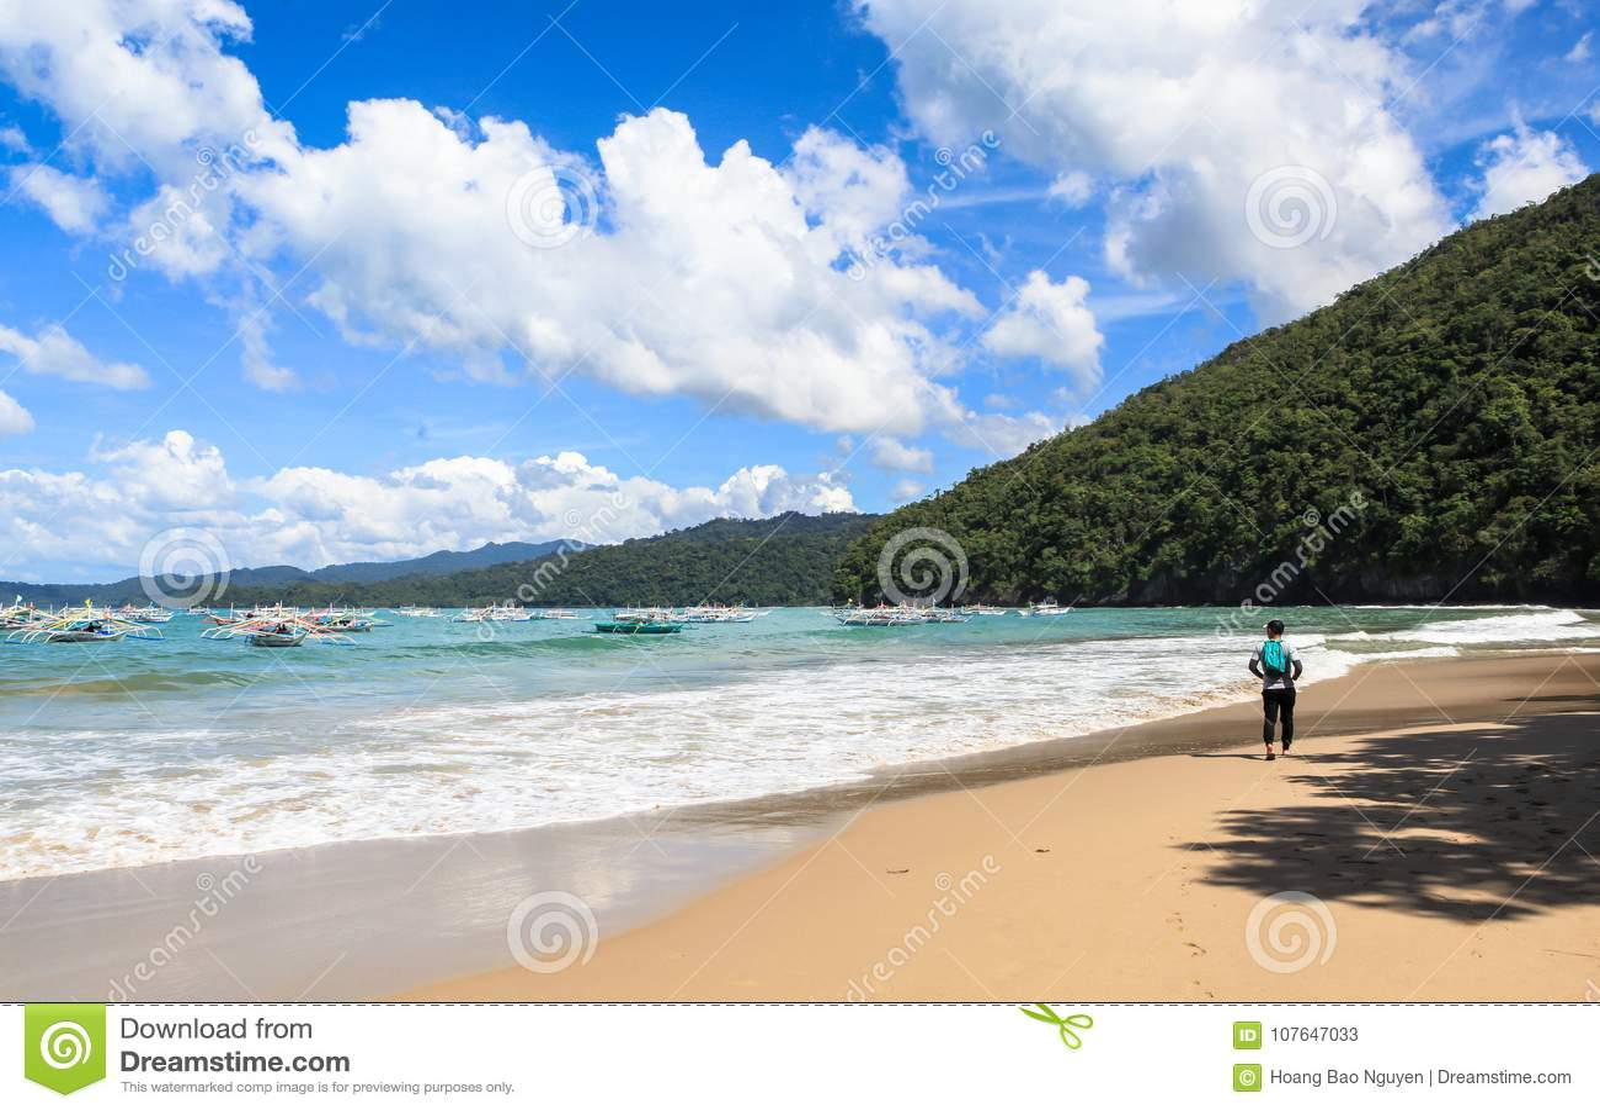 The Beach Of Puerto Princesa Philippines Editorial Stock